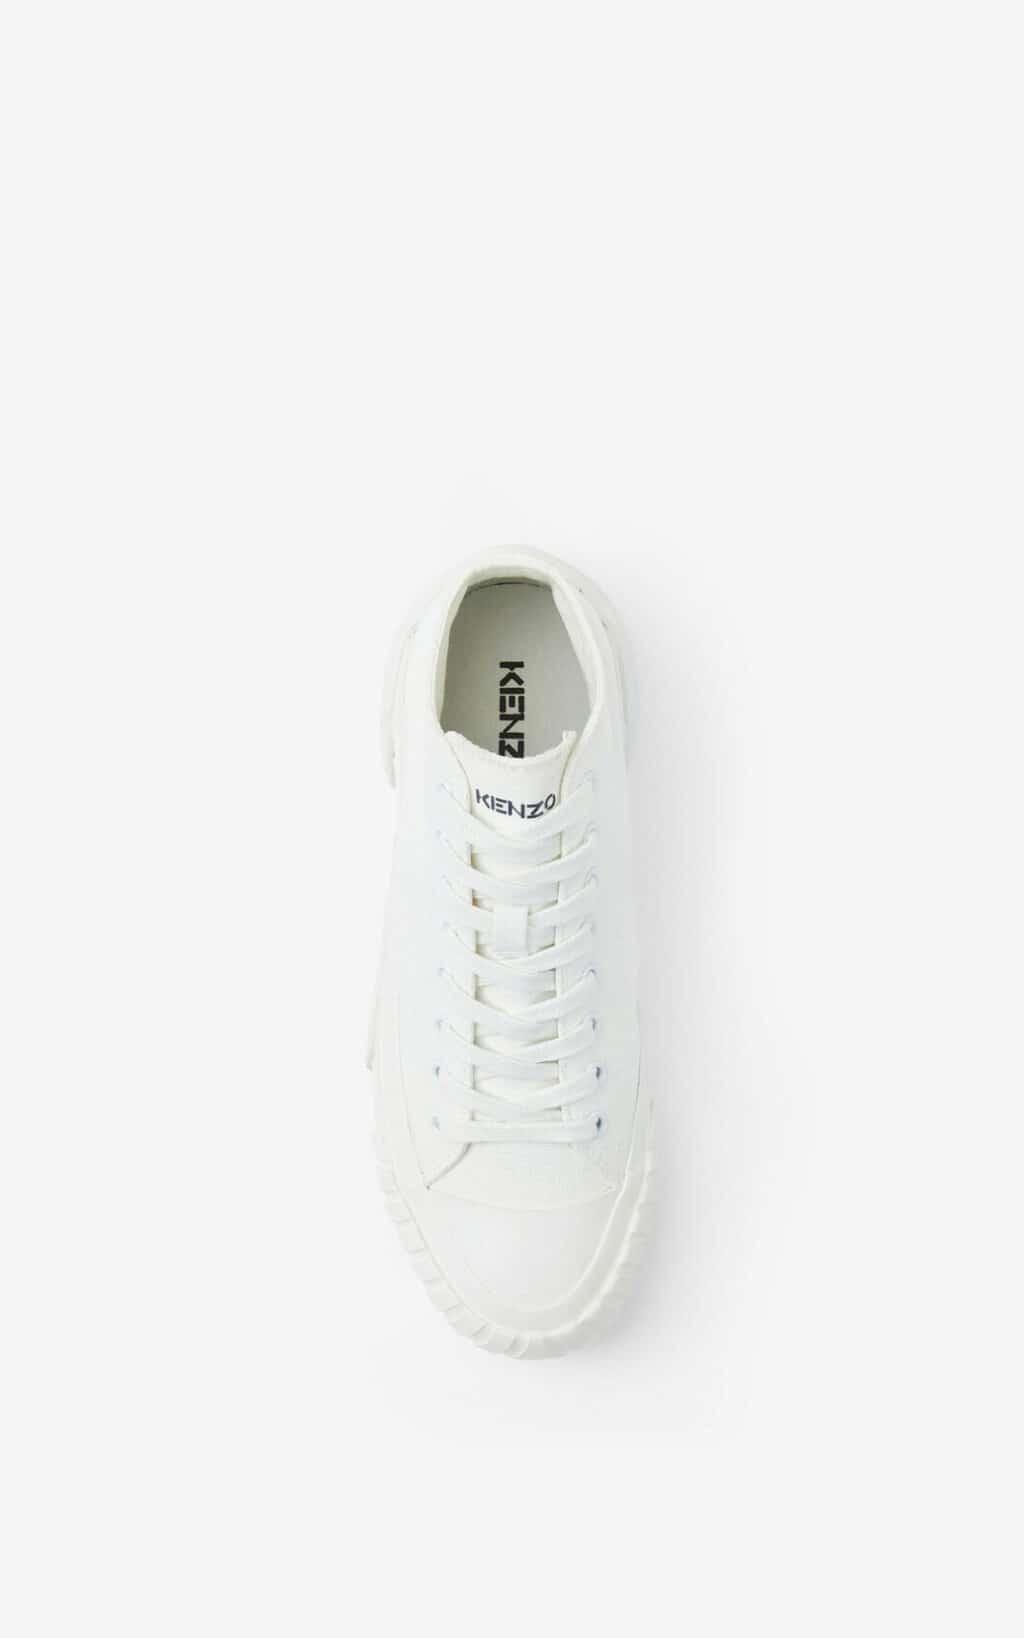 Kenzo High Top  Sneakers